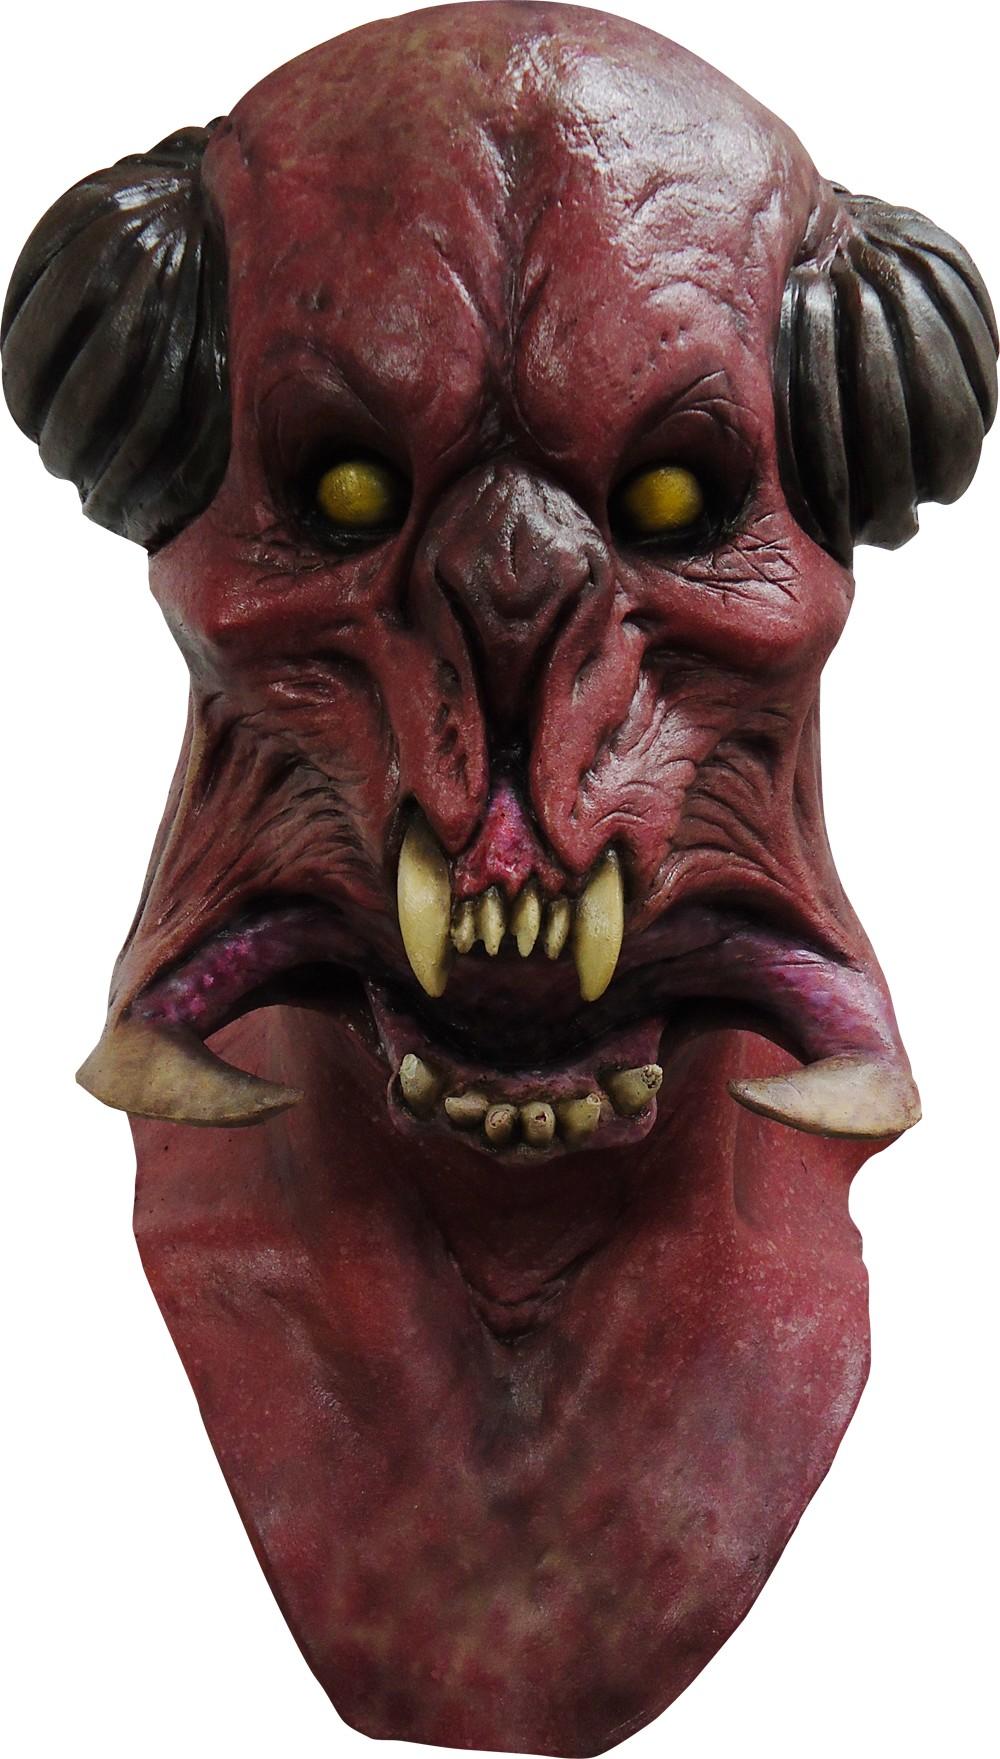 gruselige monster maske halloween rot schwarz beige g nstige faschings masken bei karneval. Black Bedroom Furniture Sets. Home Design Ideas